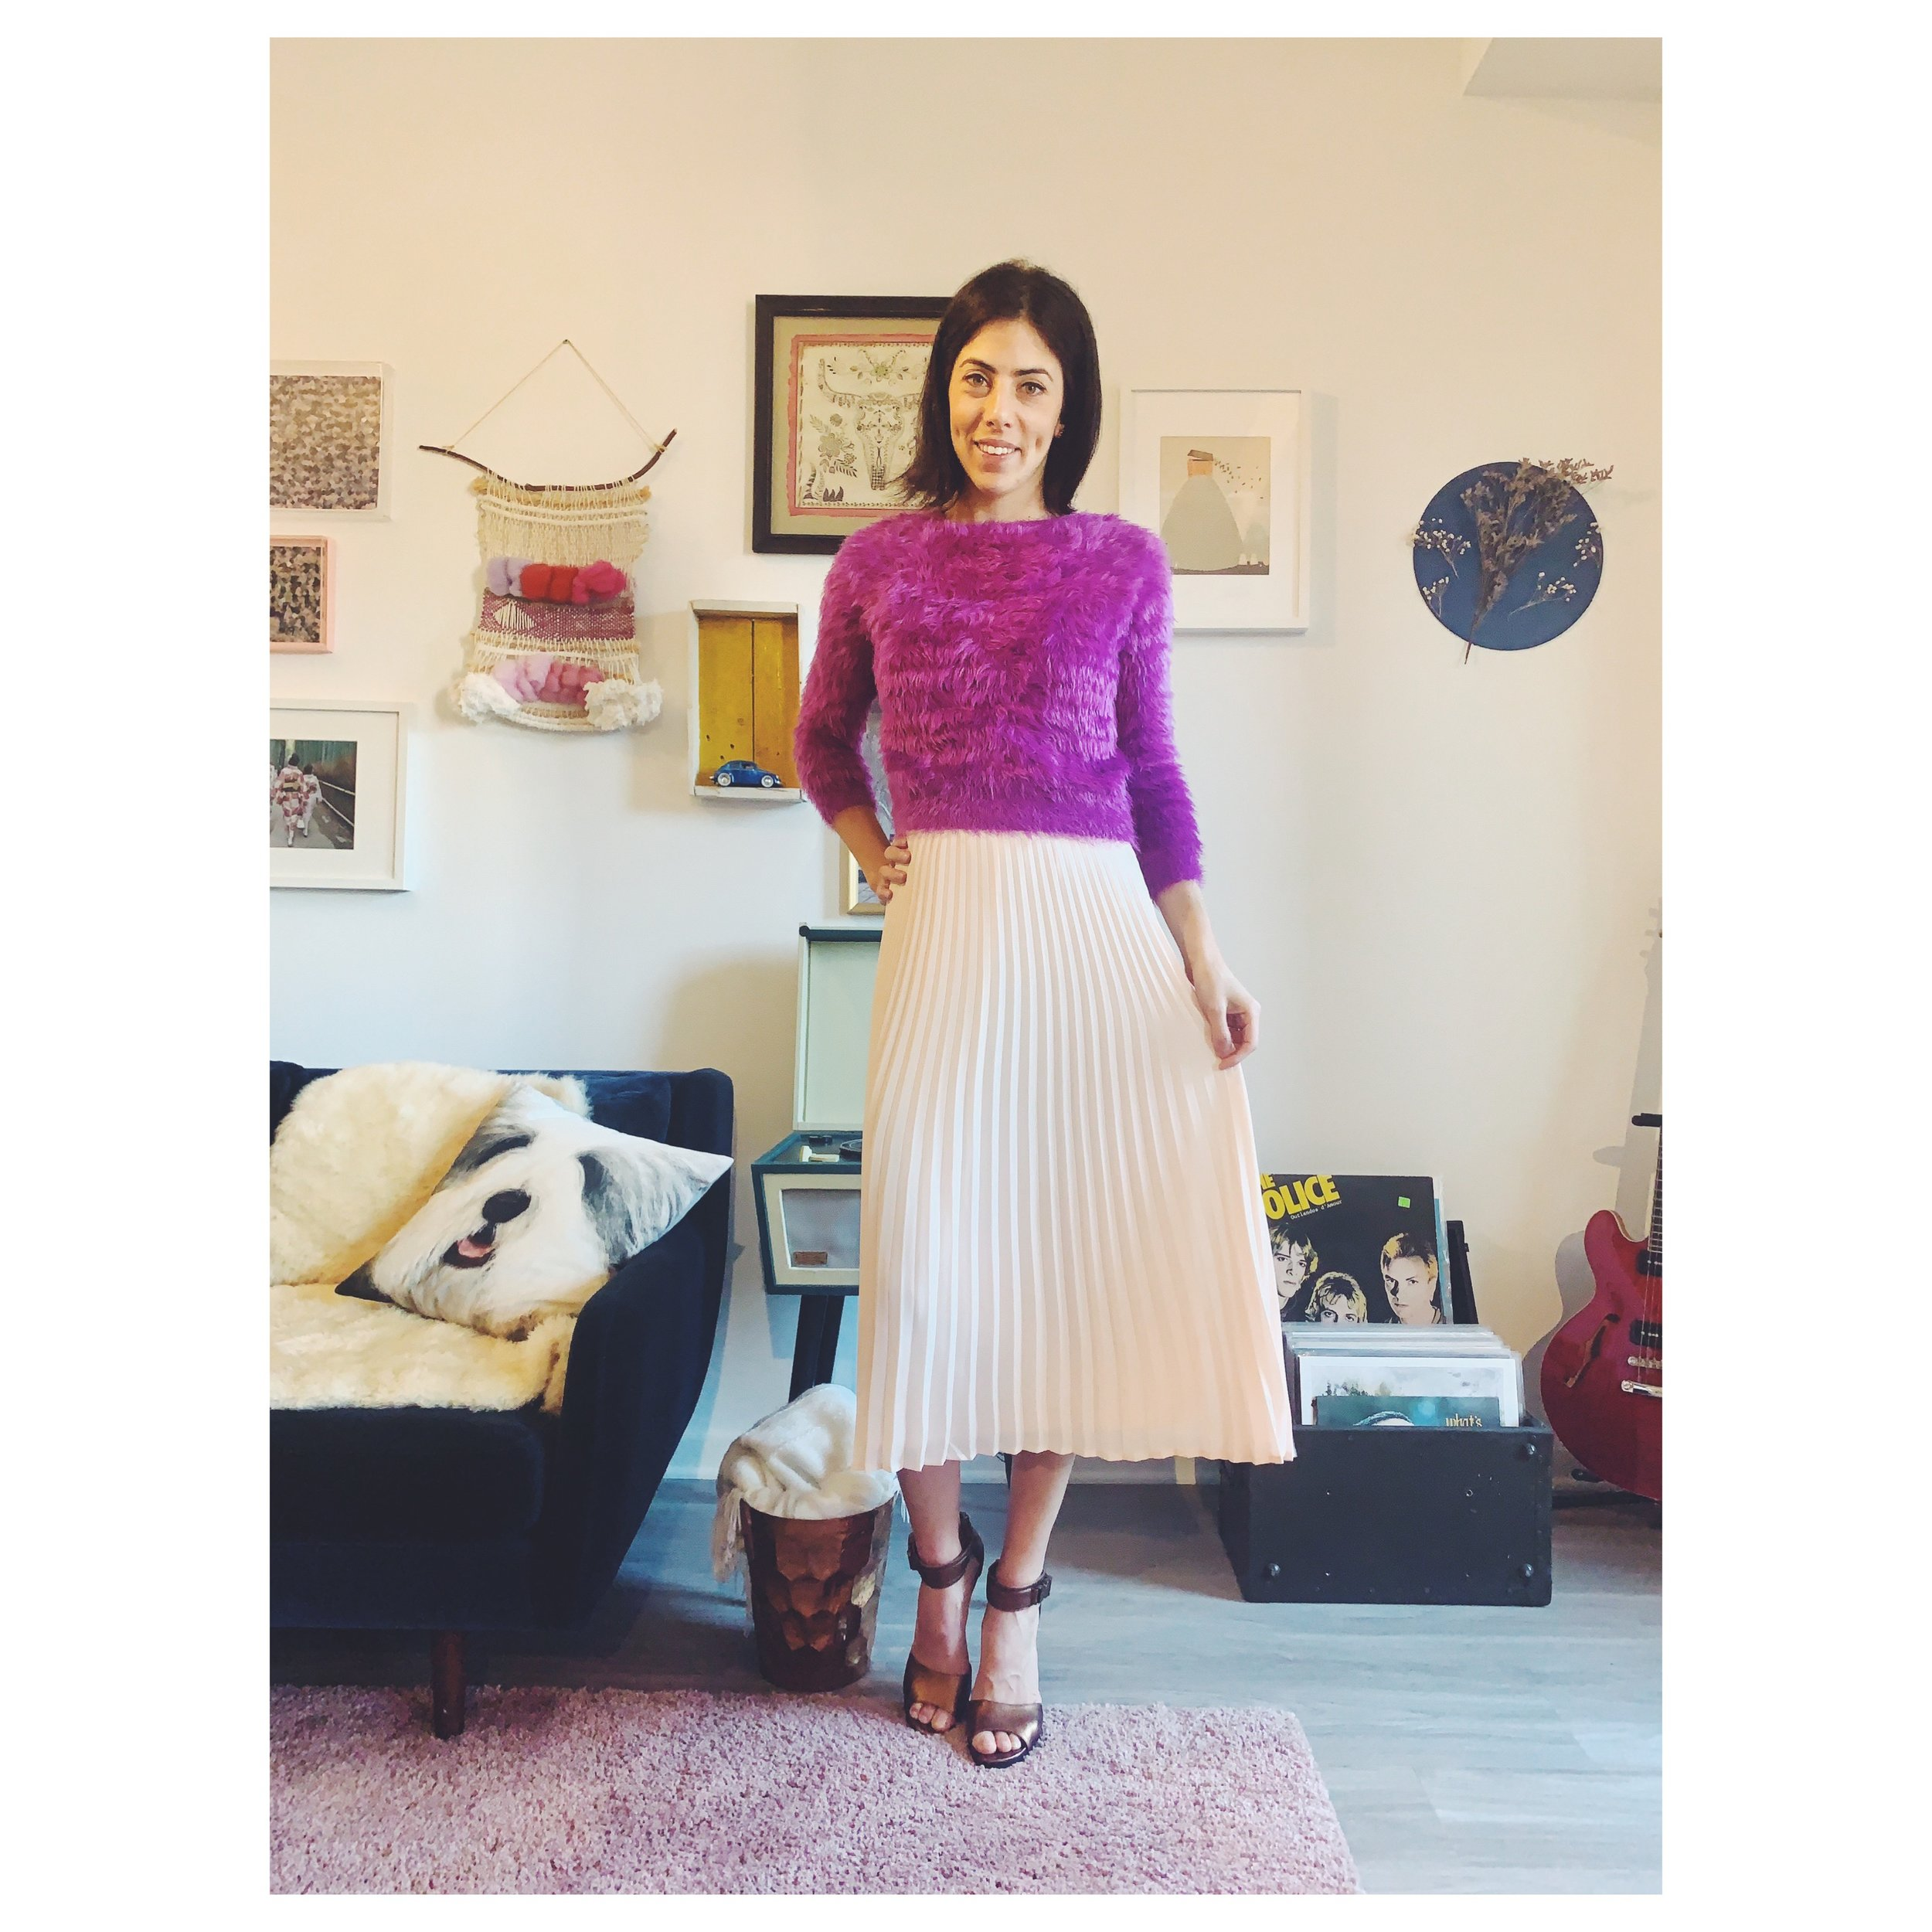 Blusa rosa pelinho - Instagram 3.JPG